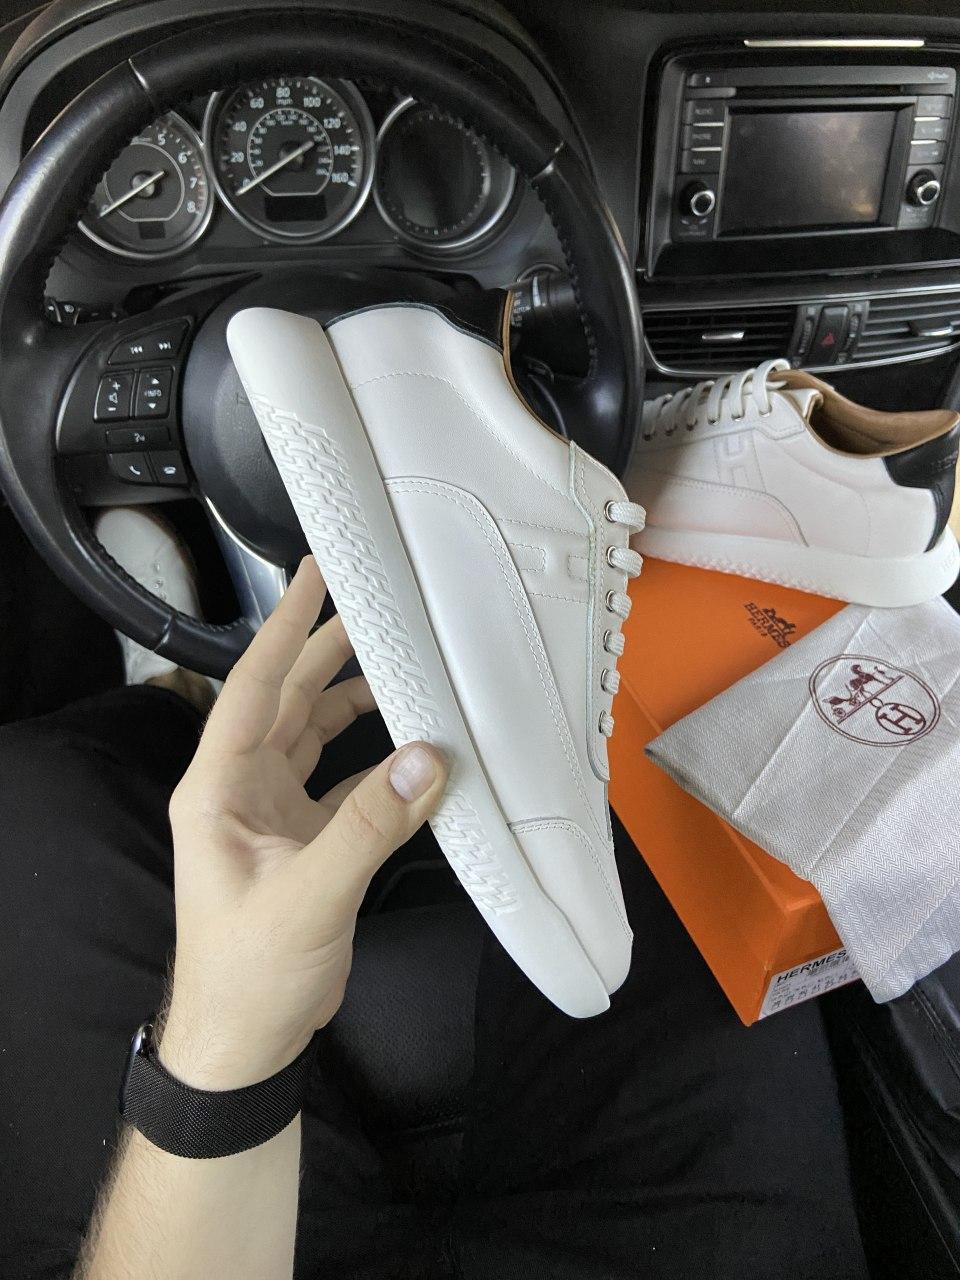 Мужские кроссовки Hermes Shoes White / Гермес Шуз Белые